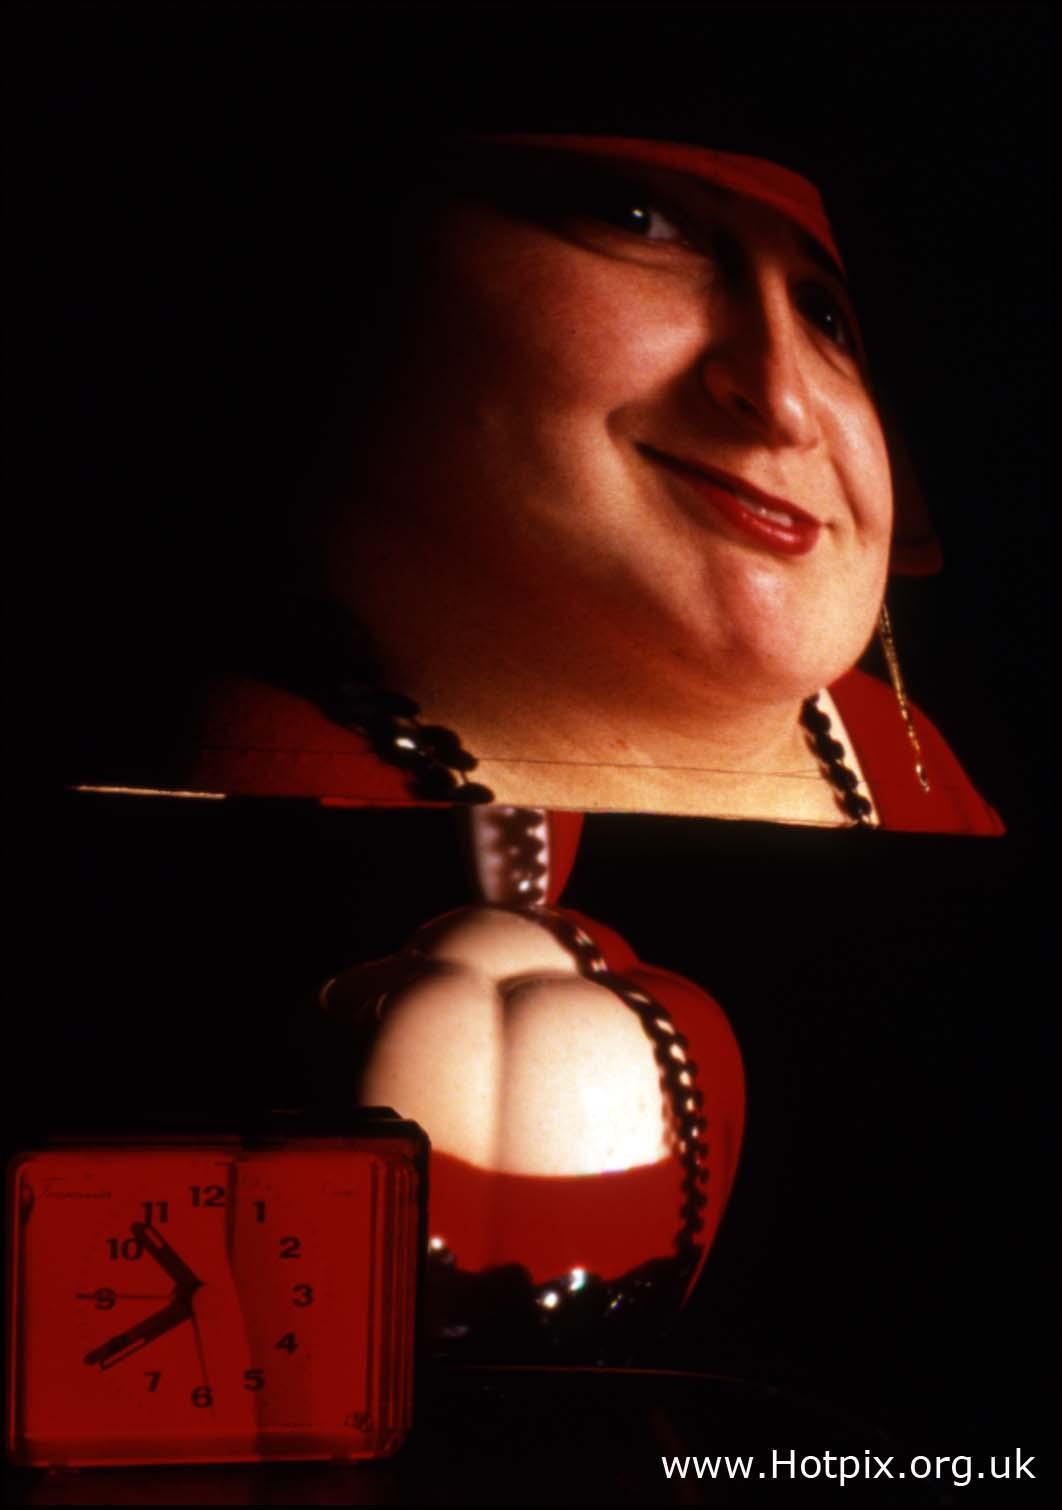 red,lamp,lady,girl,woman,projection,slide,portrait,strange,bizarre,interesting,face,image,visage,special,effect,sex,sexy,porn,porno,girlie,this photo rocks,rot-rosso-rouge-rood,erotic,pretty,fetish,fetishist,hotpicks,muchacha,femenina,de,la,mujer,se\u00f1ora,female,\u5973\u6027\u30e1\u30b9\u306e\u5973\u6027\u306e\u5973\u306e\u5b50,\u592b\u4eba\u5973\u6027\u5987\u5973\u5973\u5b69,fille,f\u00e9minine,femme,dame,hotpix!,tony smith photography,tdktony,tdk,tony,tdktonysmith,howles,wales,welsh,pontlottyn,Caerphilly,bargoed,newtredegar,new,tredegar,@hotpixuk